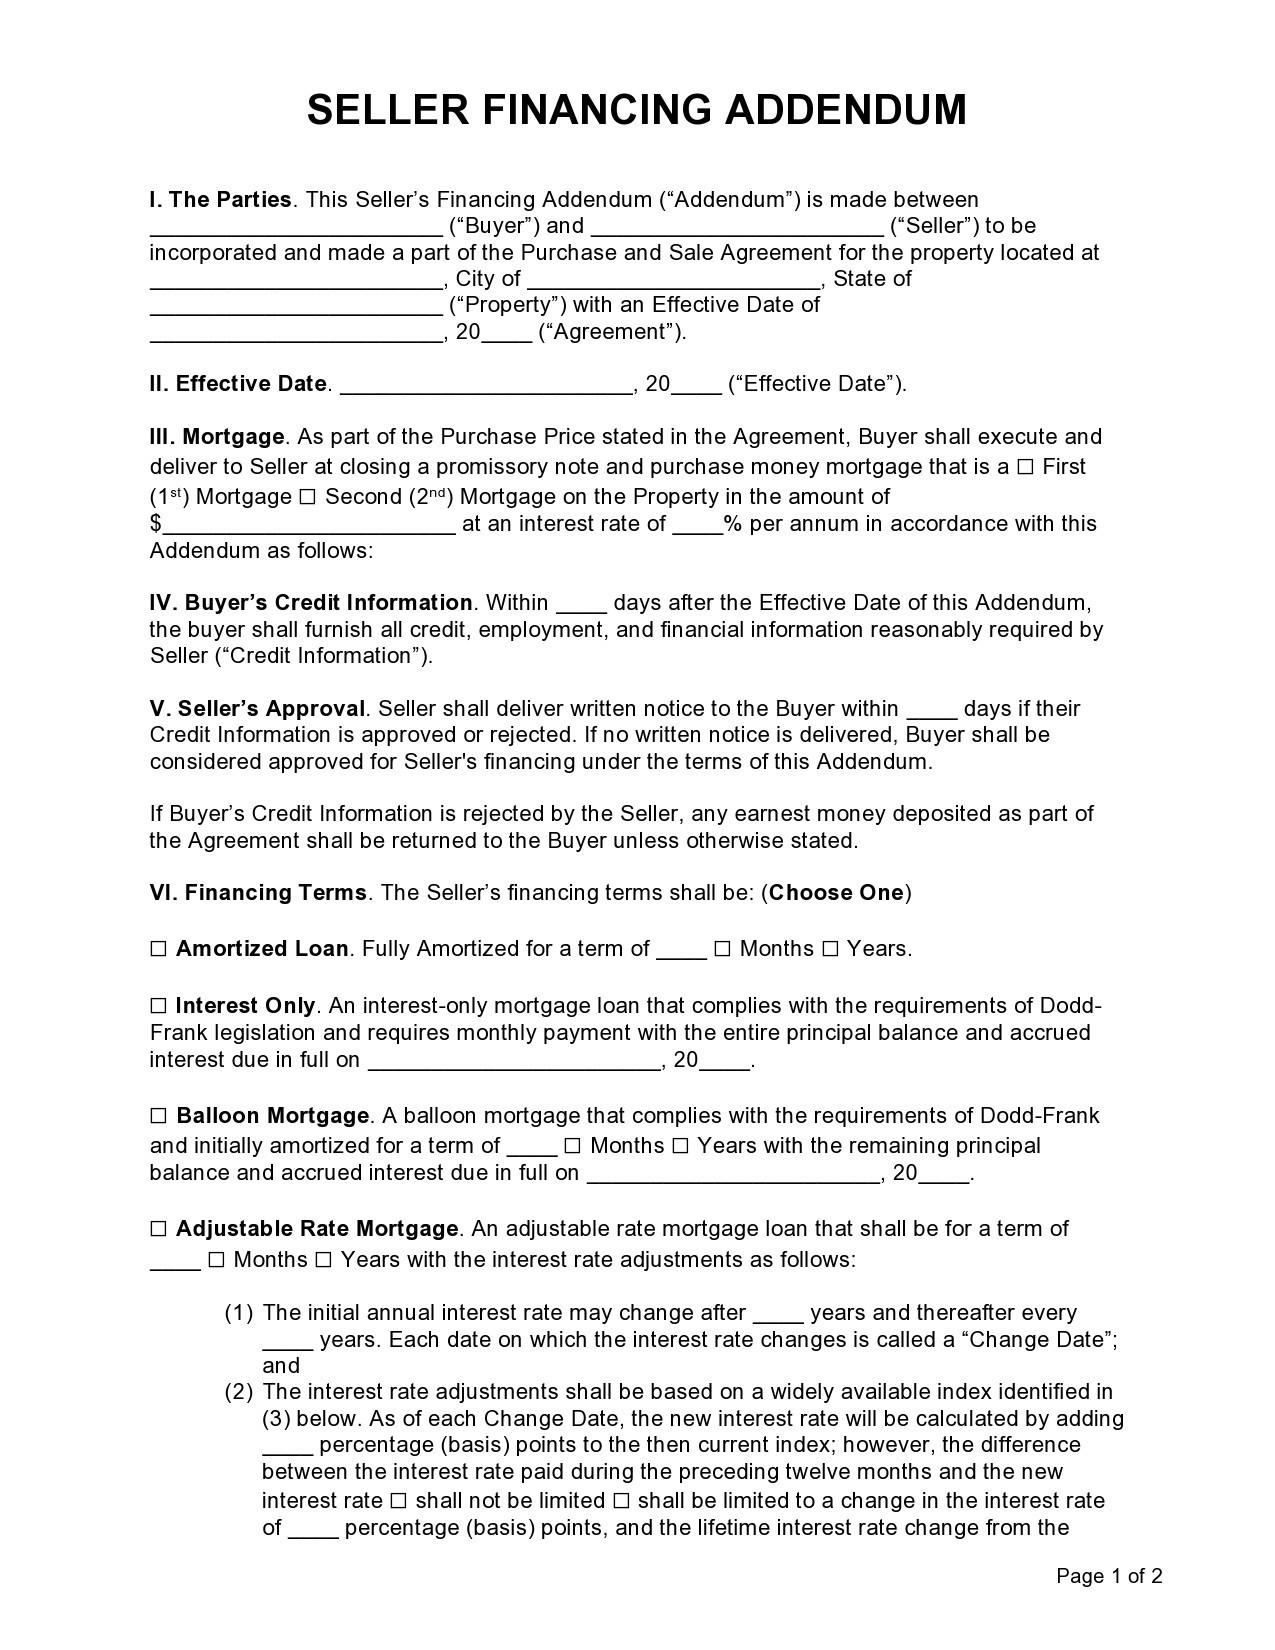 Free seller financing addendum 01